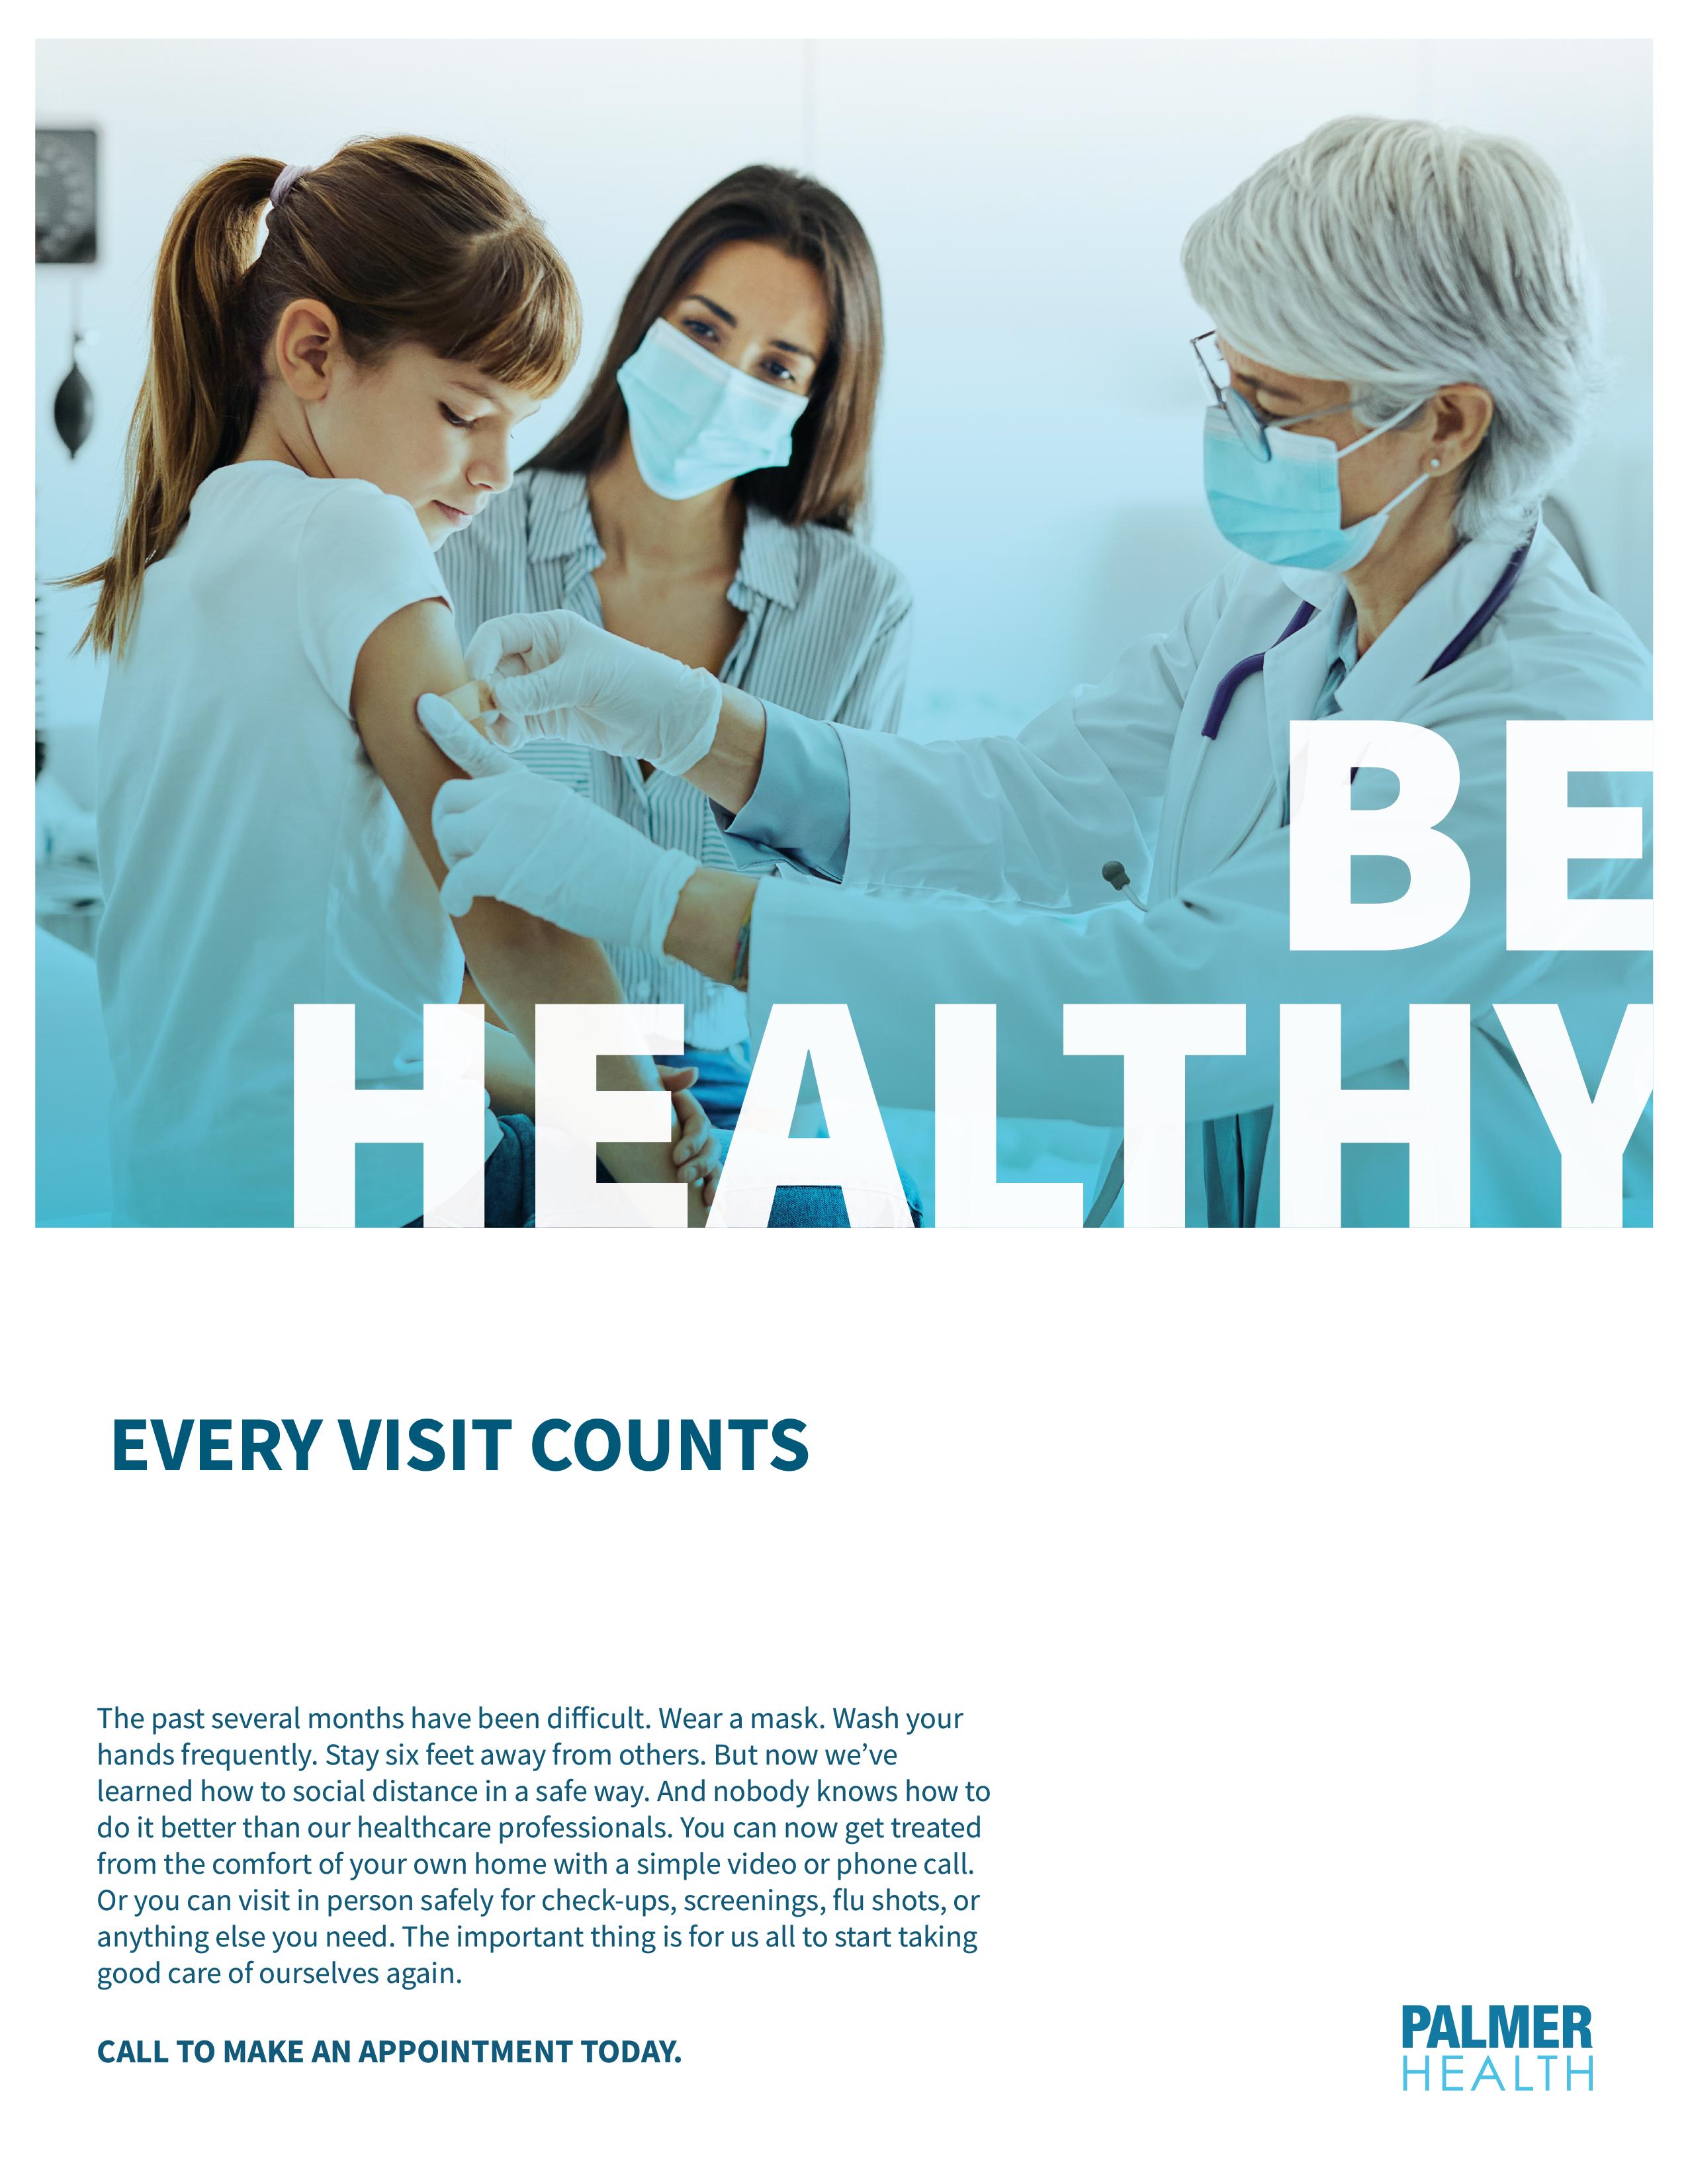 36152 Palmer health as dev for website-be  healthy-v5-aug 21-01